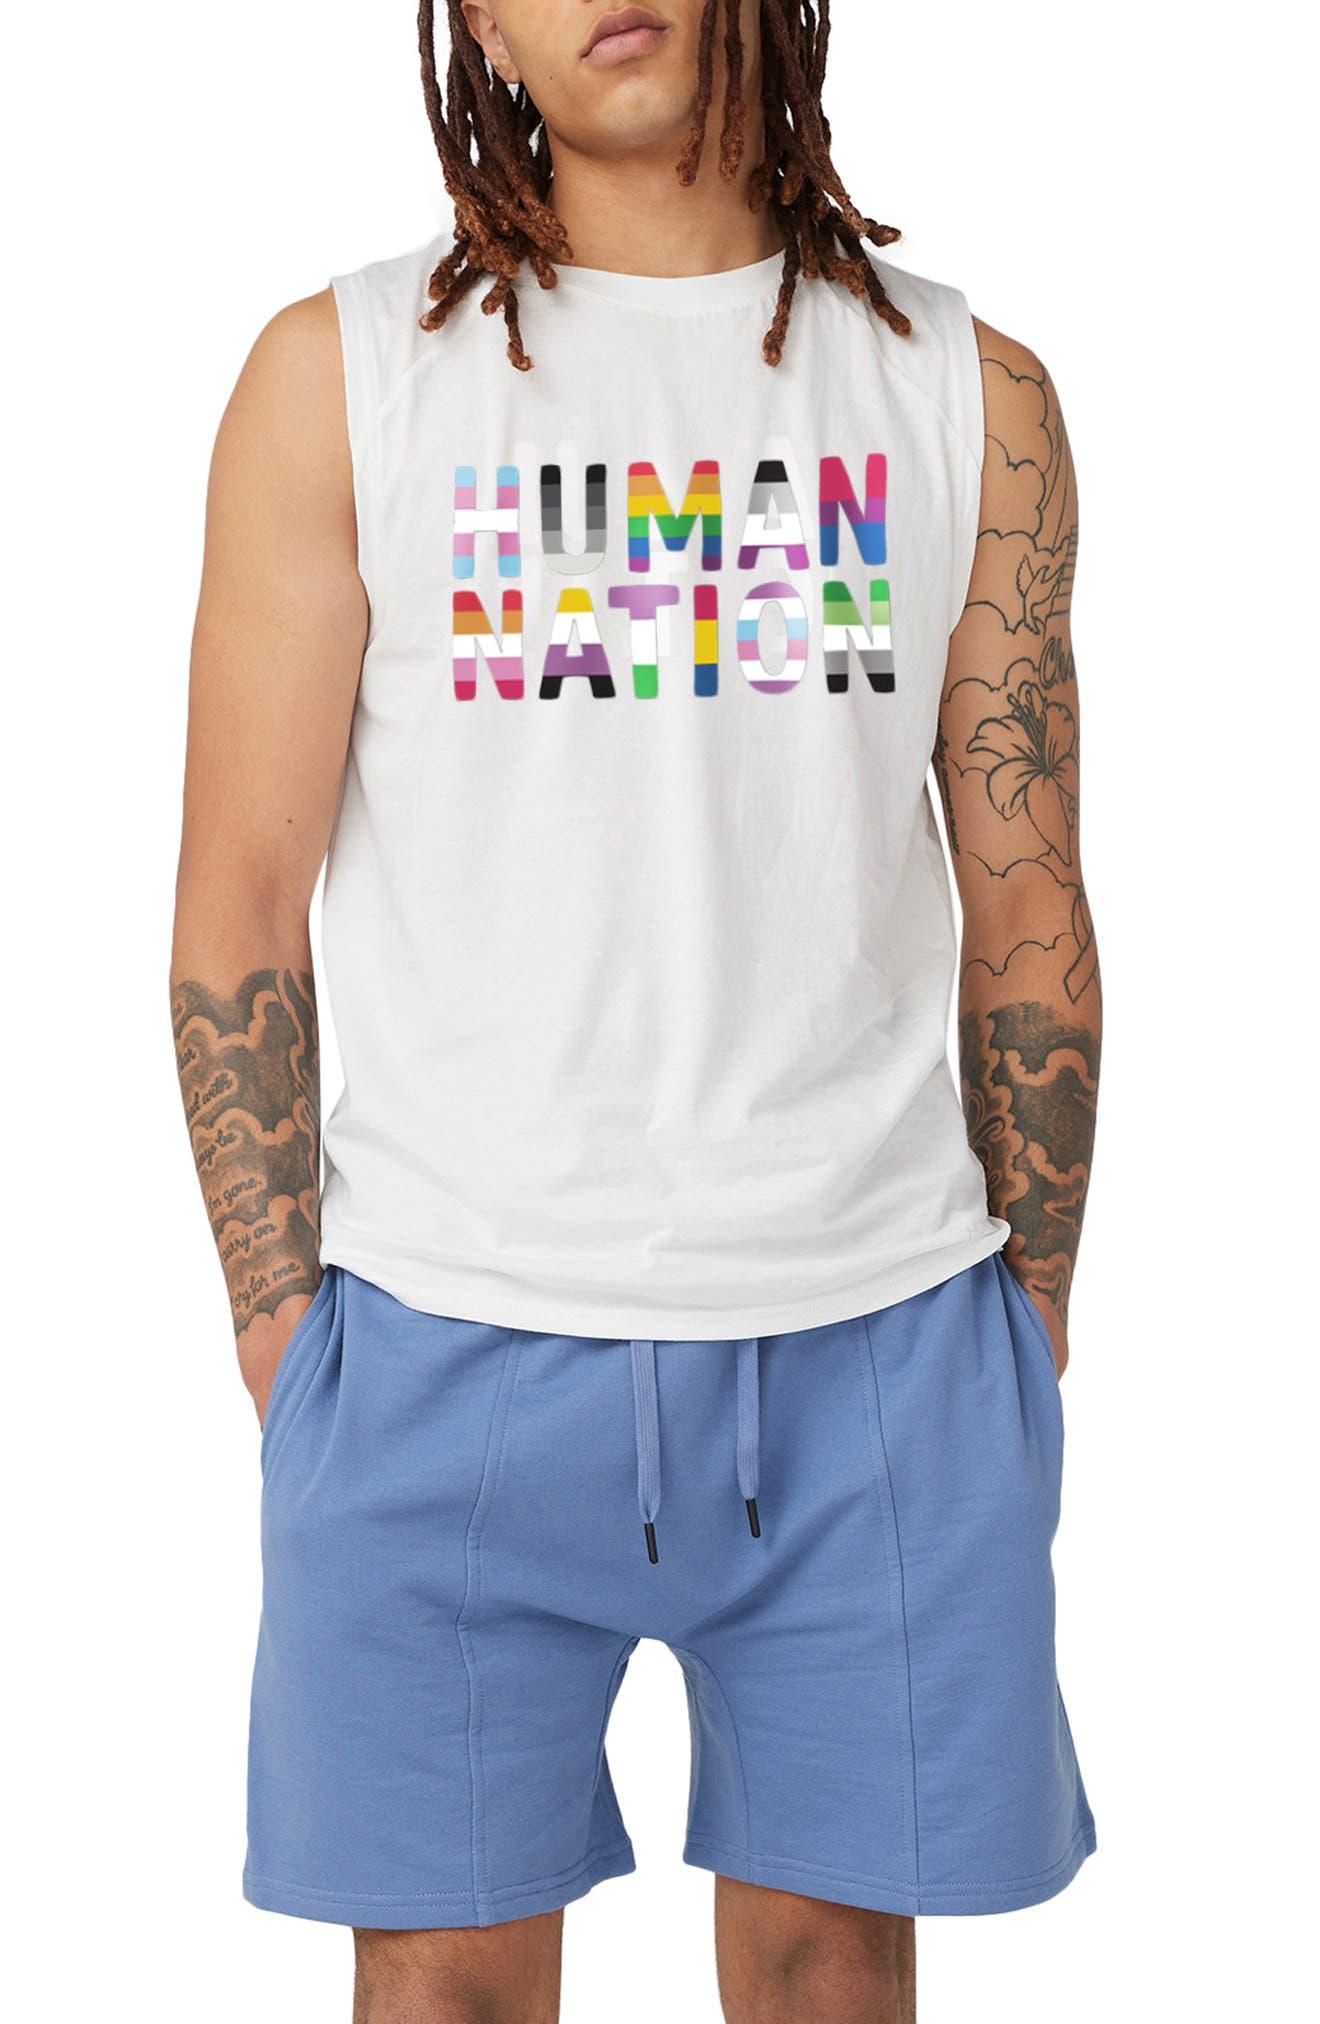 Gender Inclusive Logo Muscle Tank